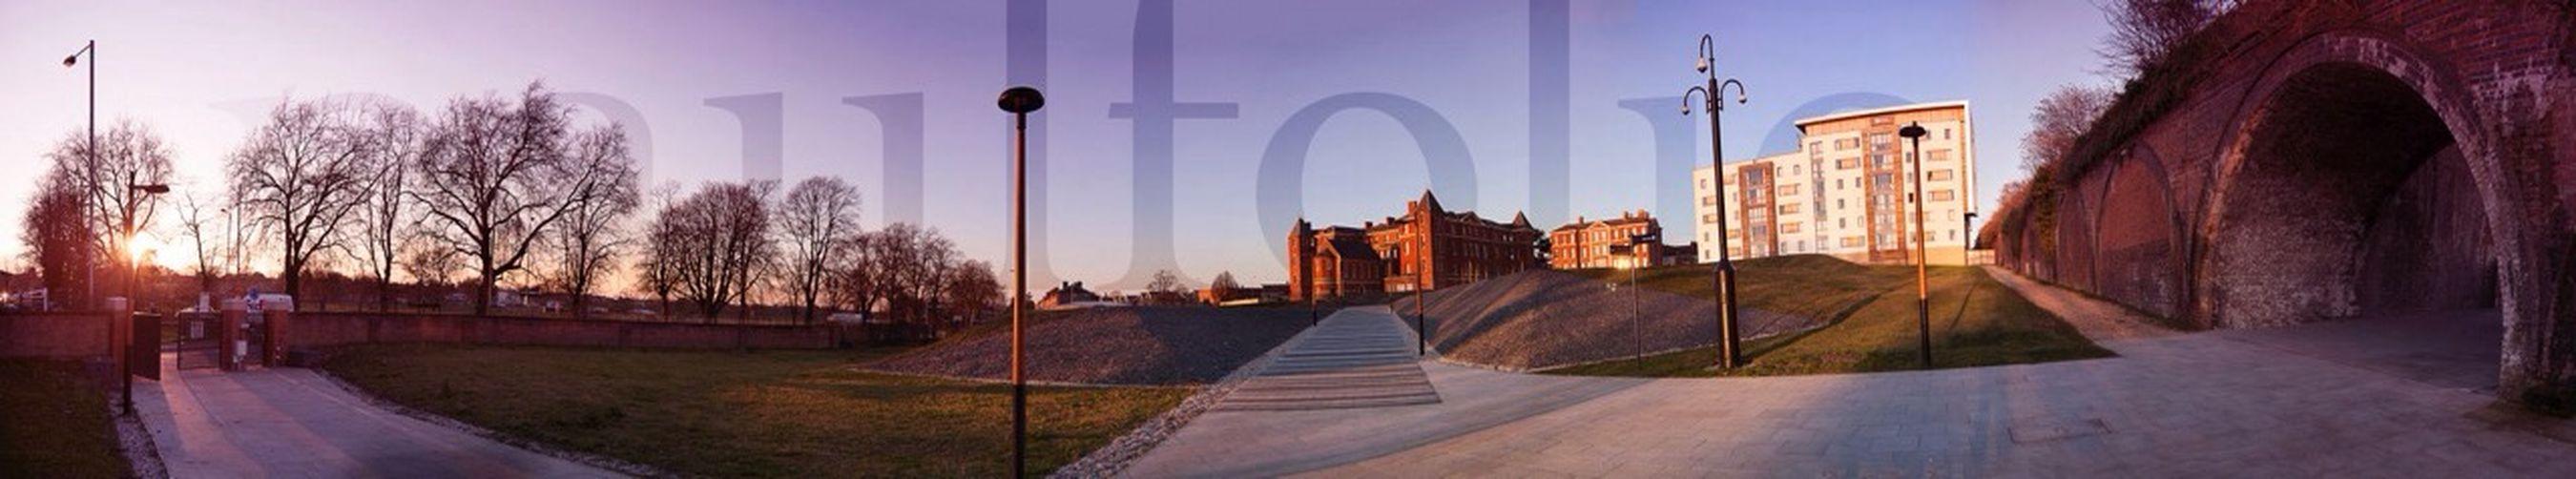 Worcester University Worcester Uni Uni Sunset City